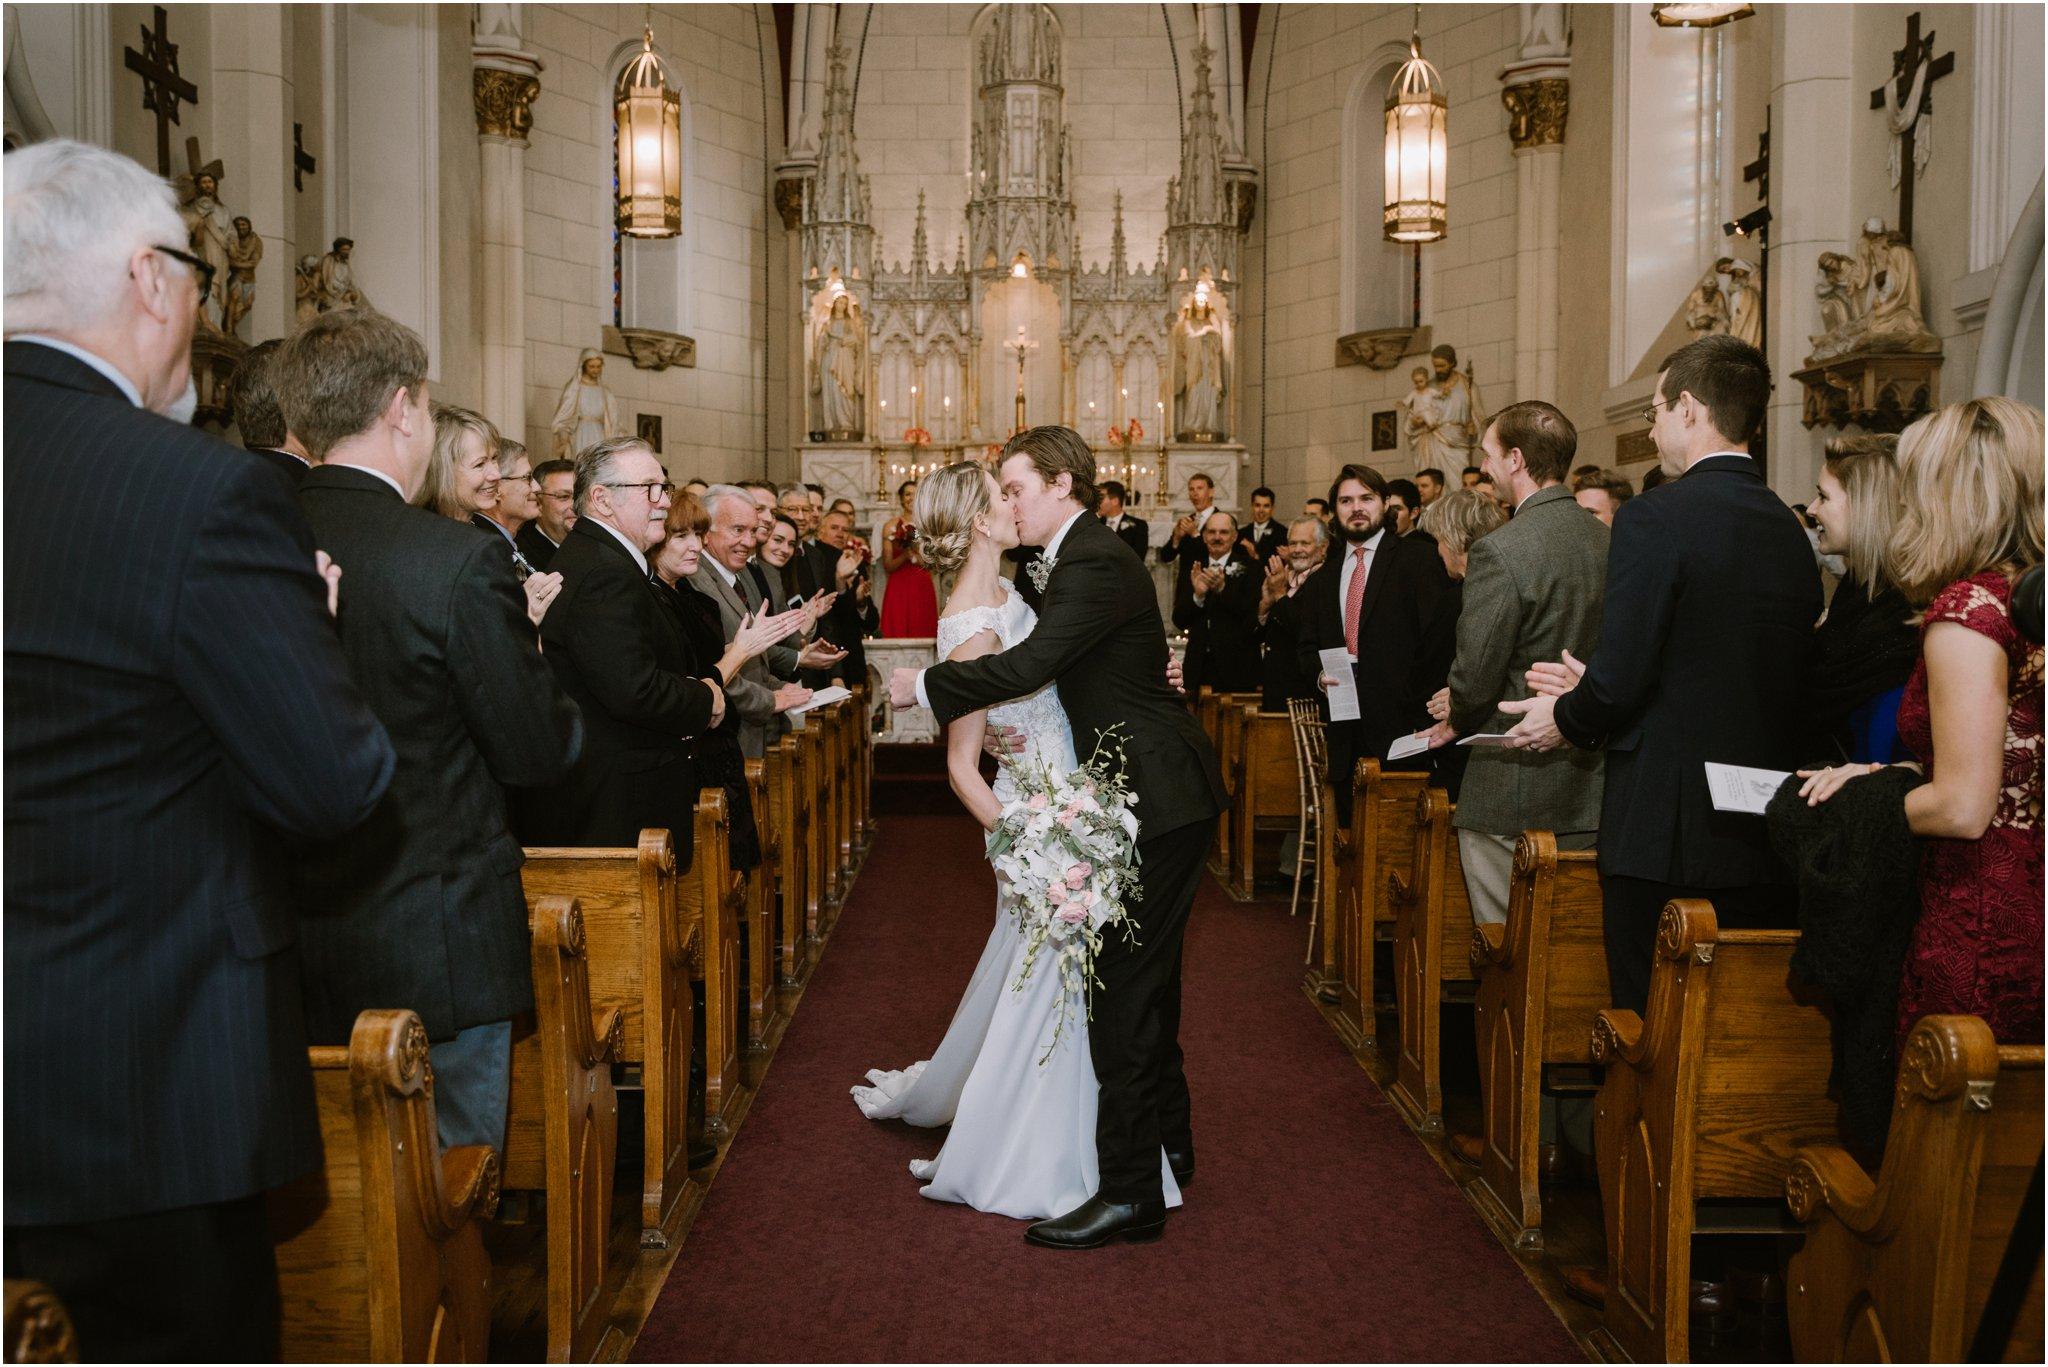 0919Loretto Chapel Wedding, Inn and Spa at Loretto wedding, Santa Fe wedding photographers, blue rose photography